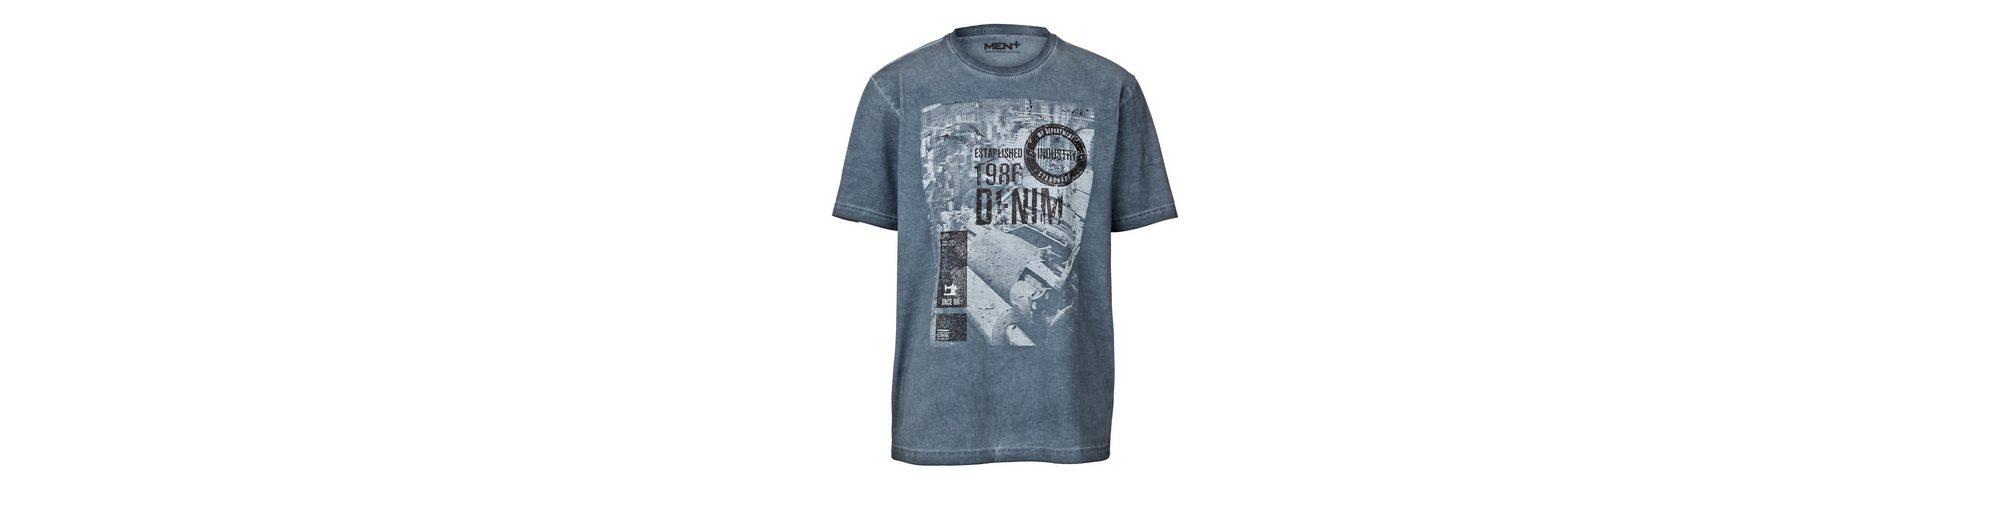 Men Plus by Happy Size T-Shirt Billig Besuch PzmHU